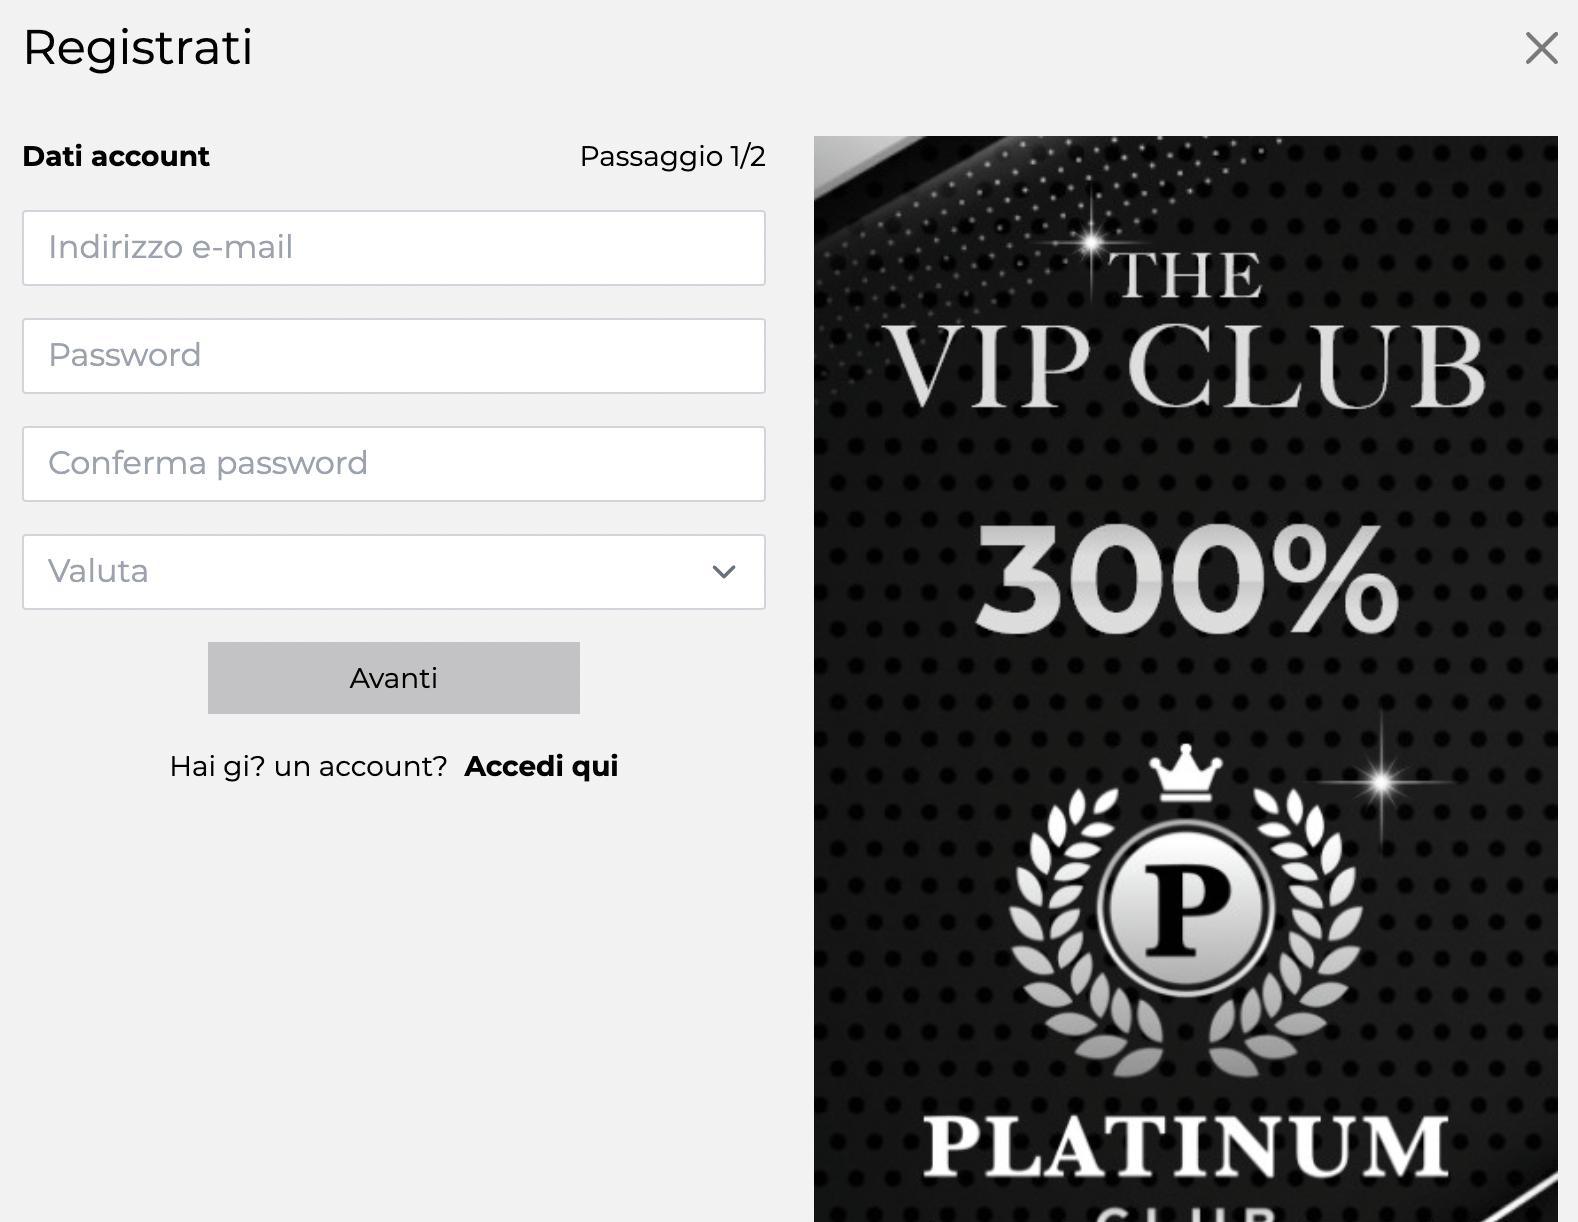 Platinum Club Vip Registrazione